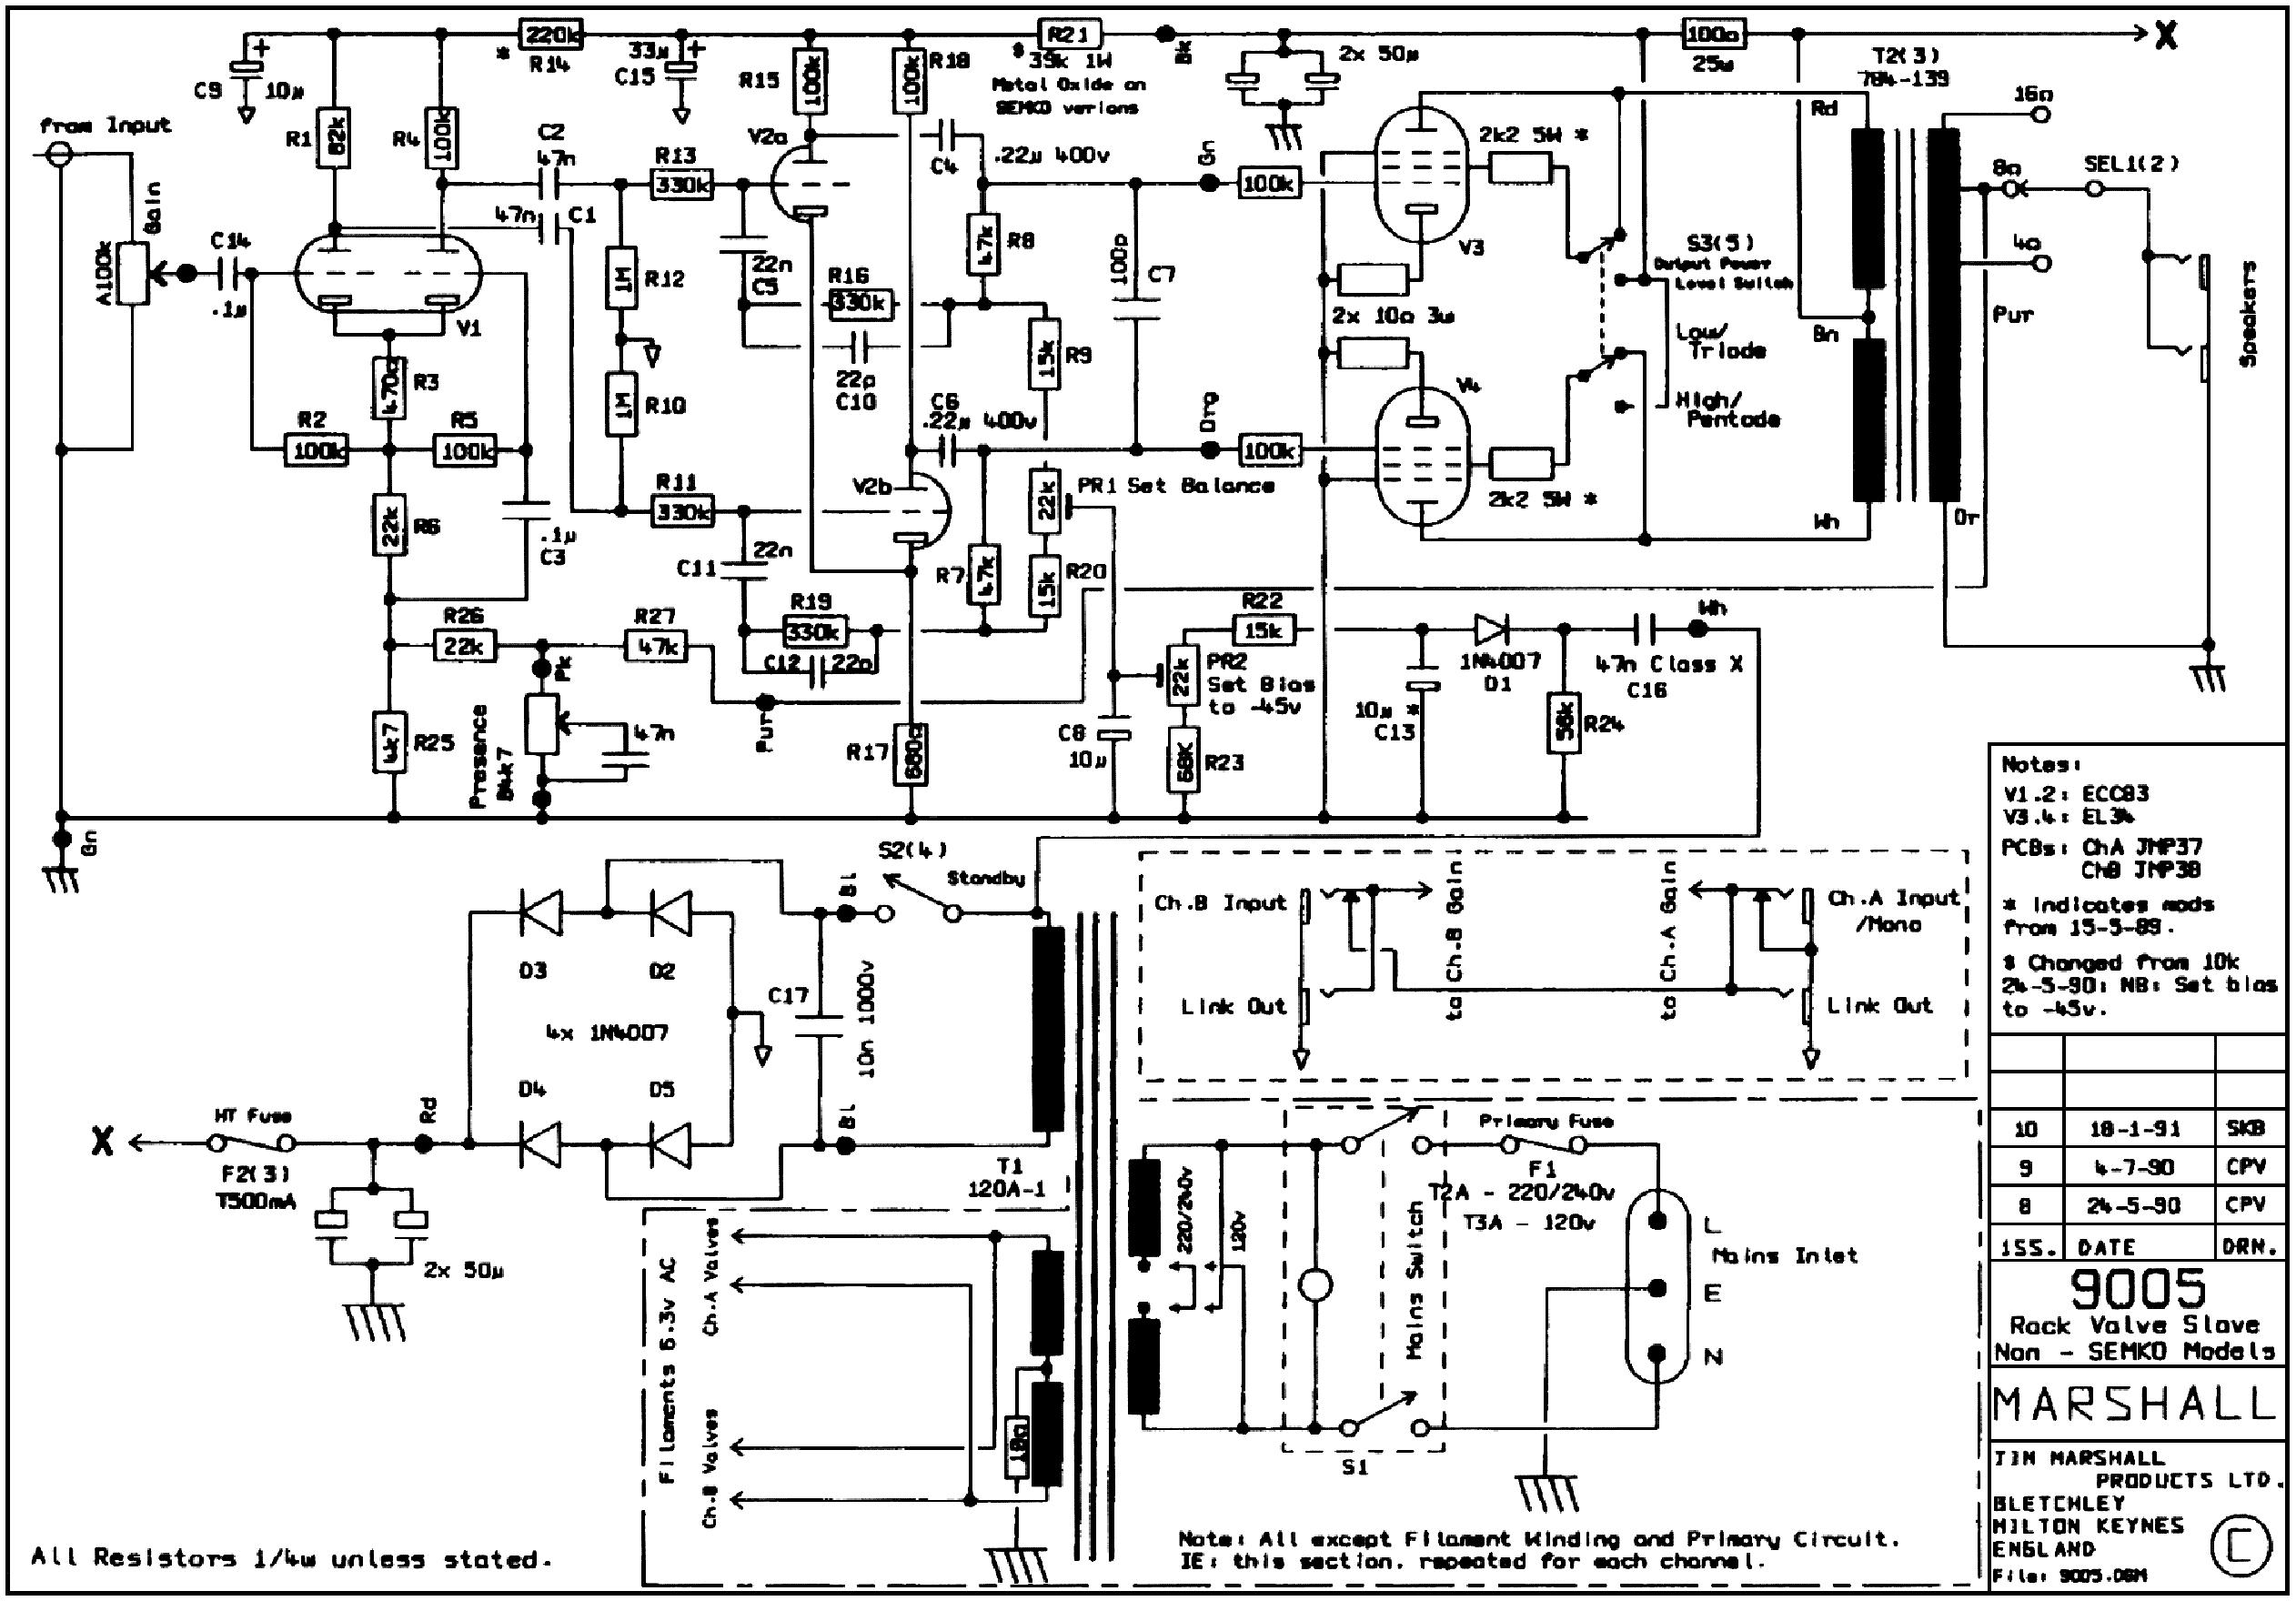 marshall rackmount poweramp 9005 sch service manual